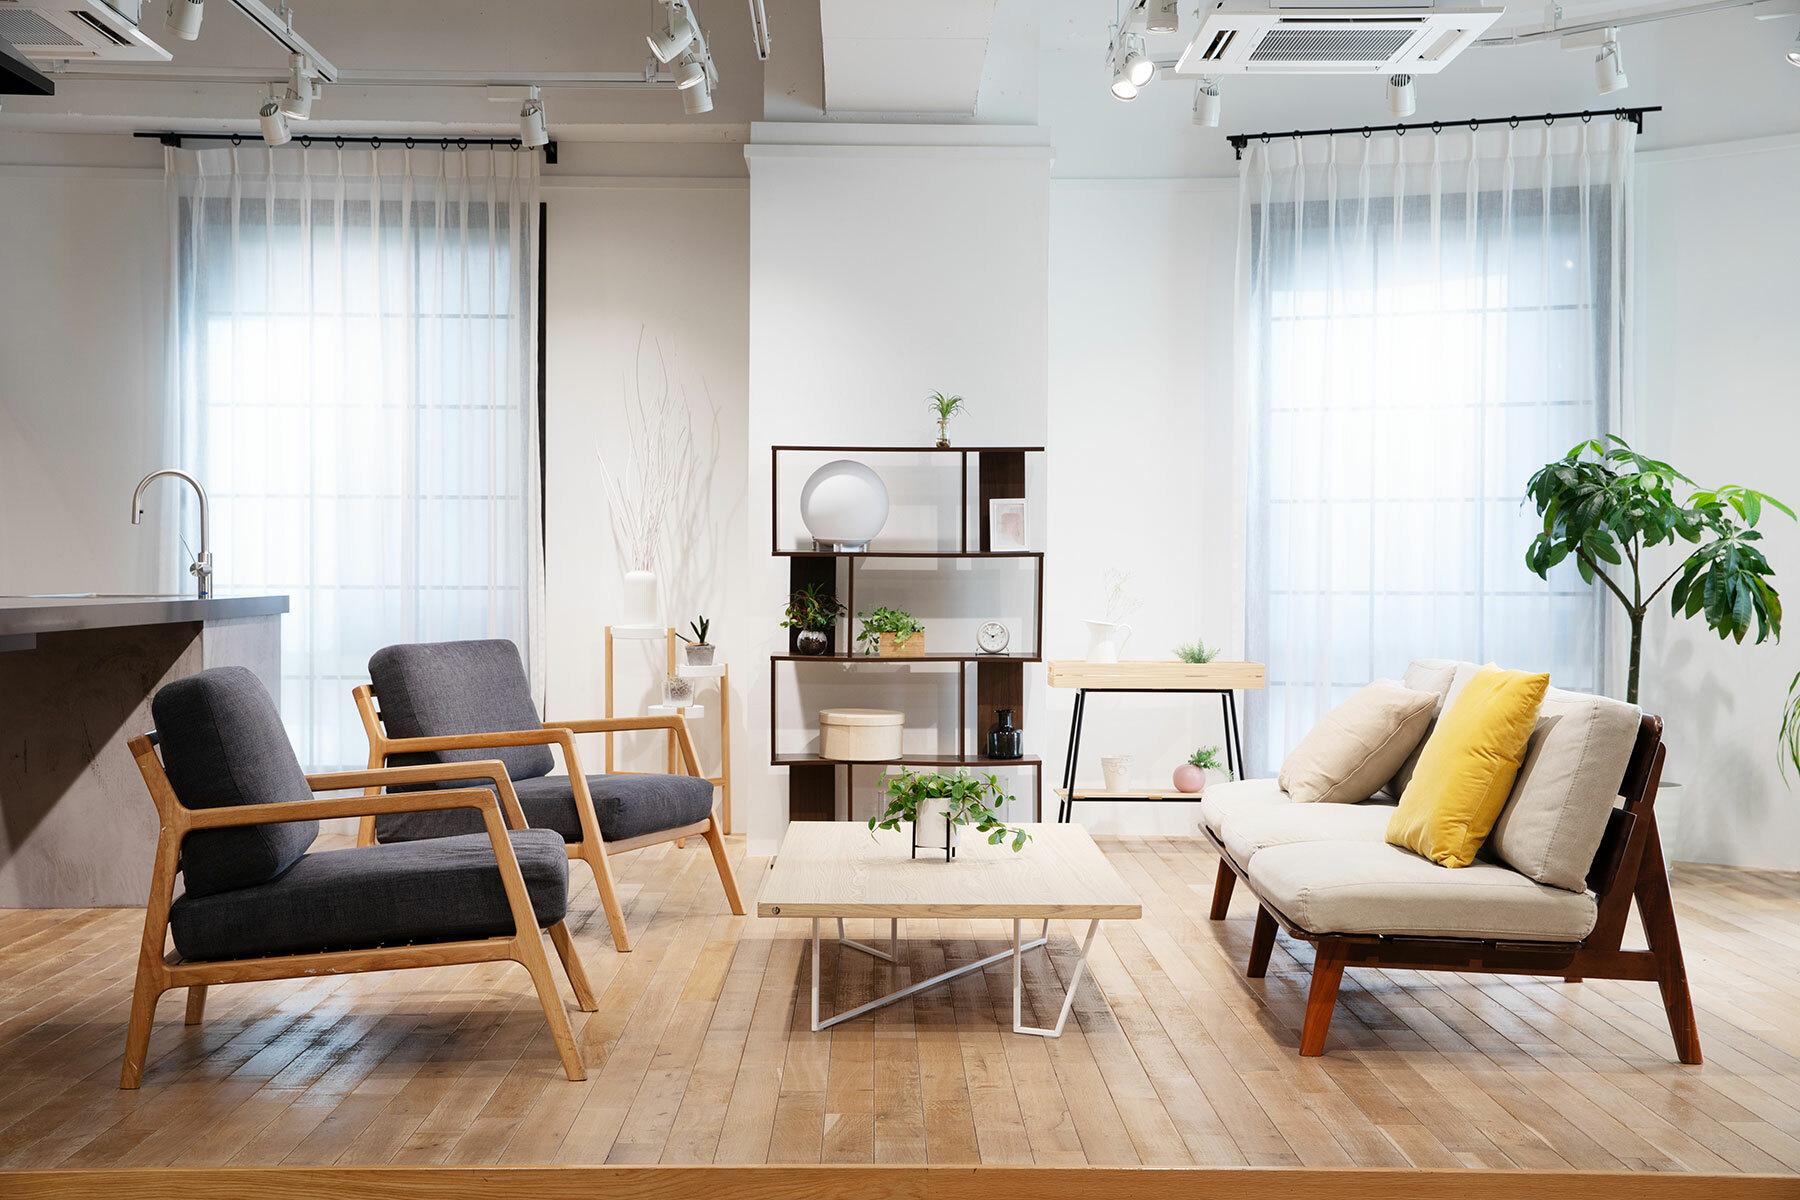 STUDIO DA VINCI (スタジオ ダ・ヴィンチ)